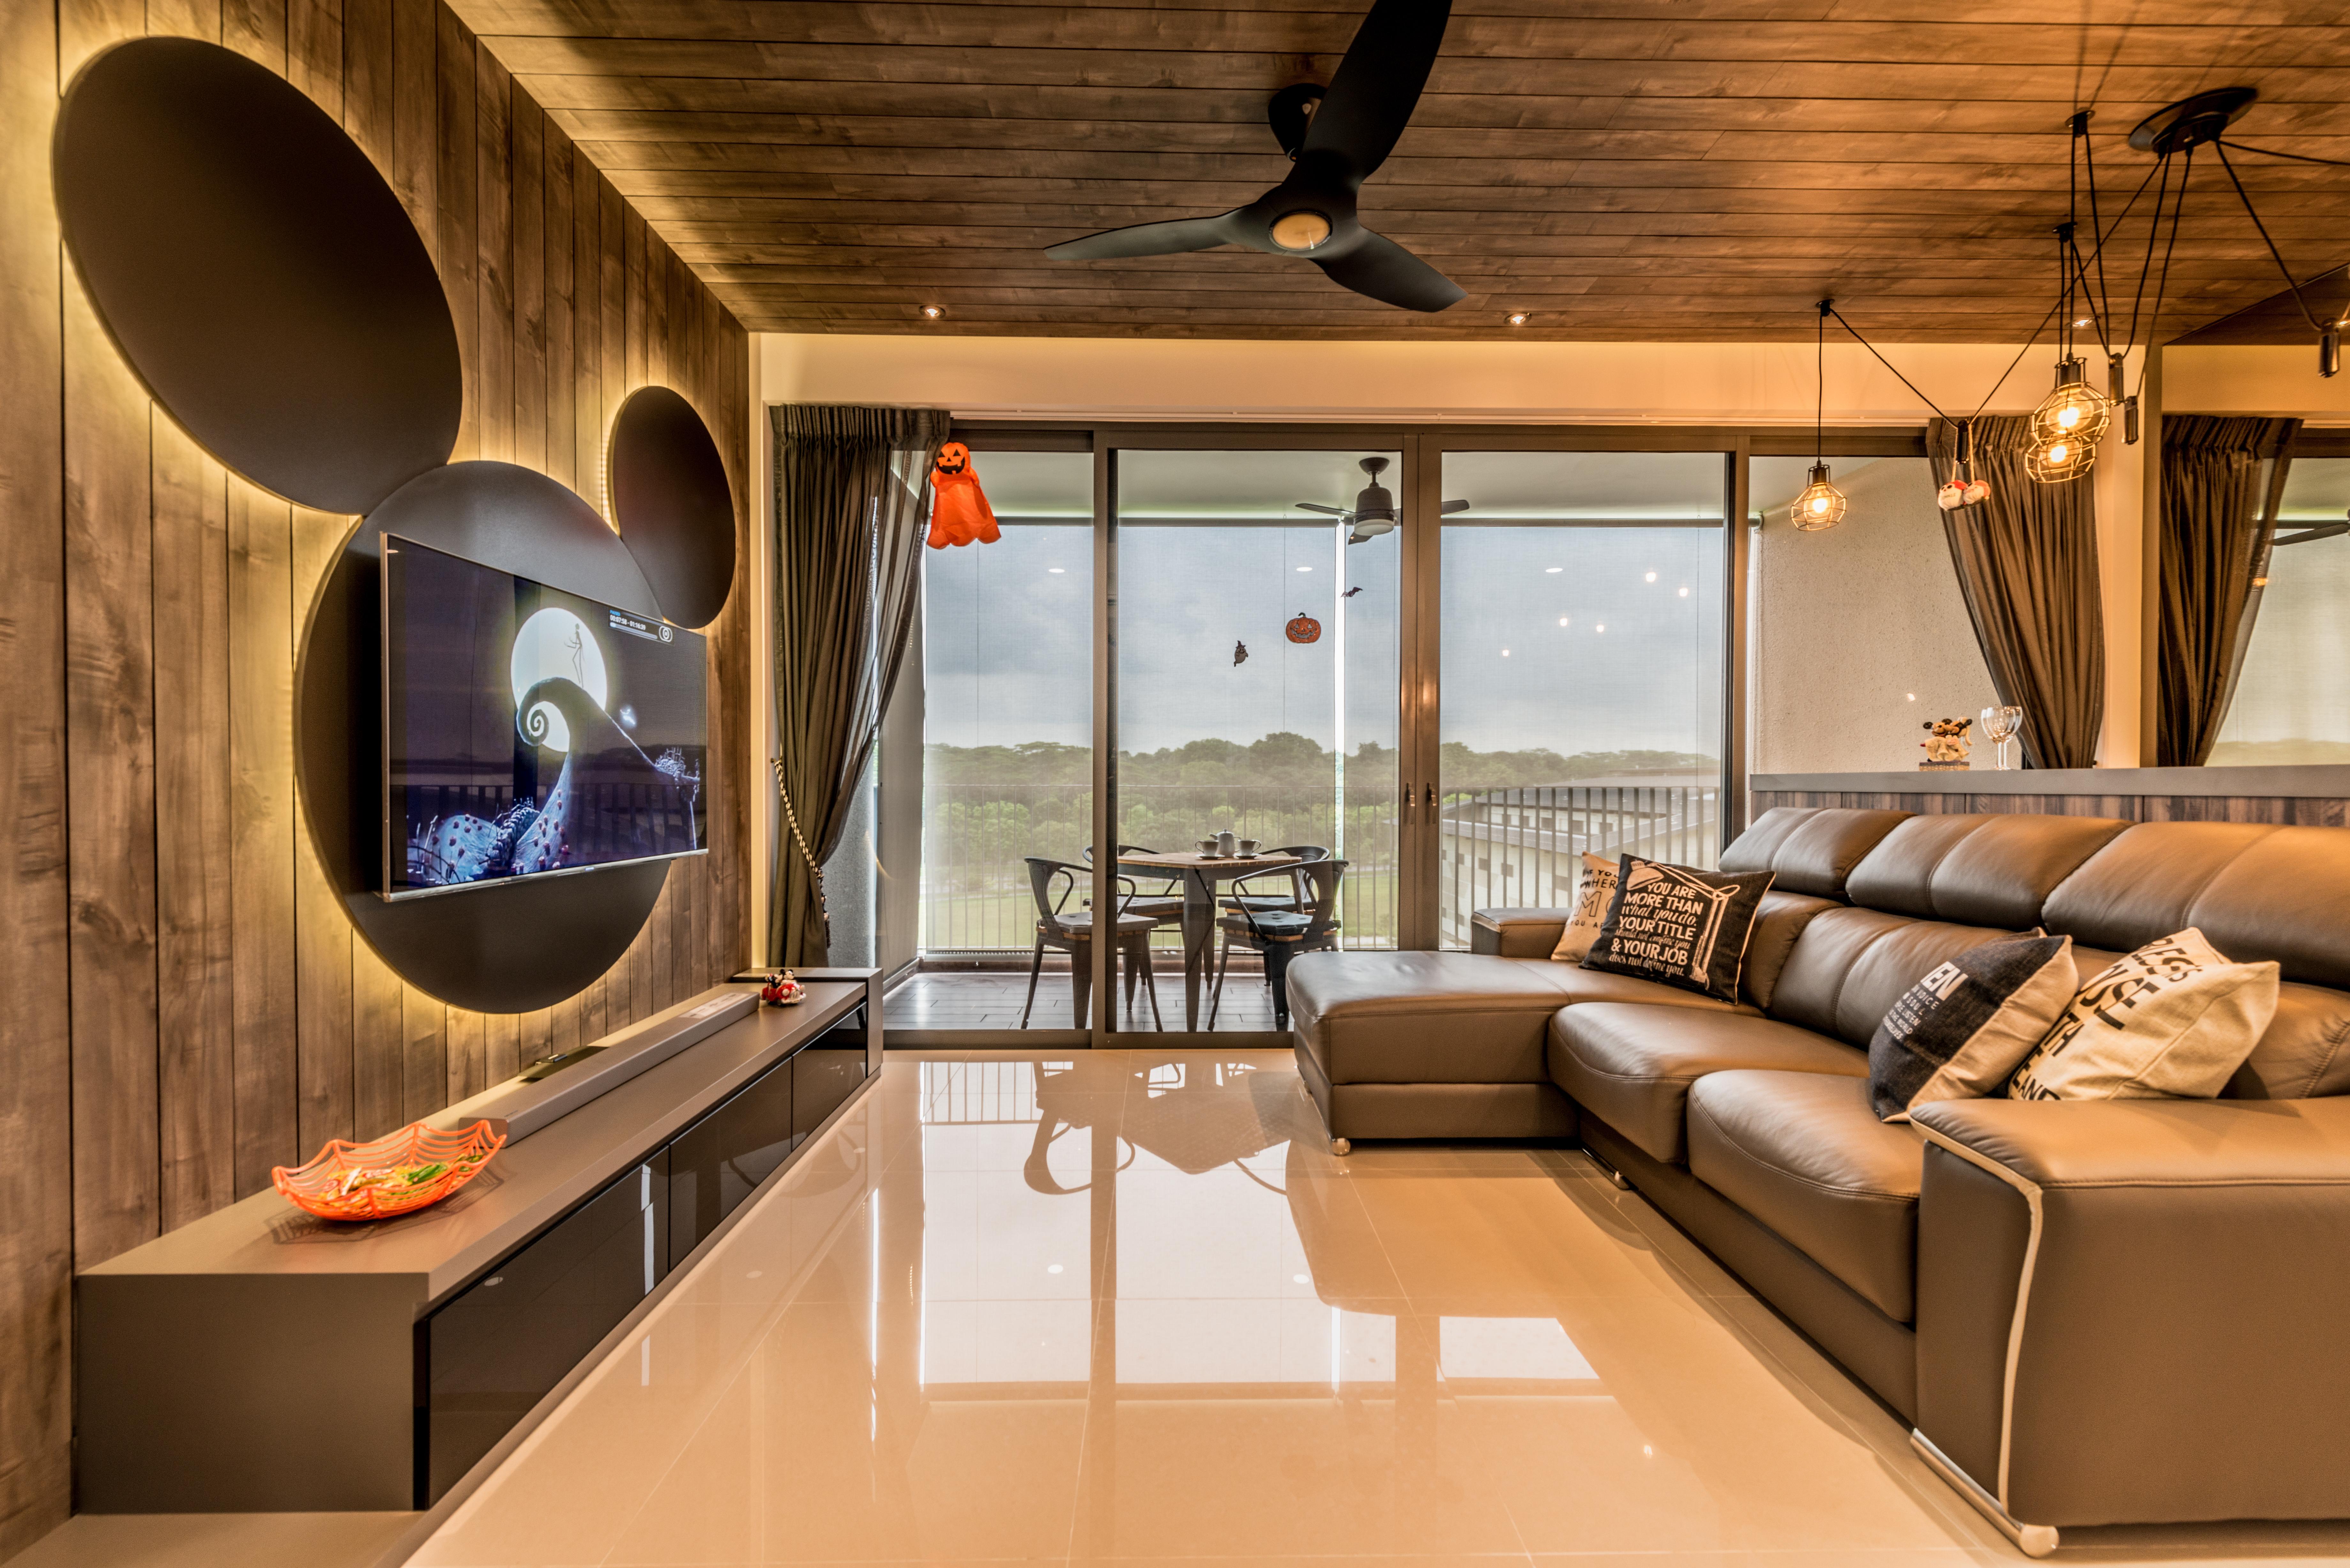 Punggol brooke water way hdb 5 room renovation - Mr Shopper Studio Mickey Disney Theme Living Apartment